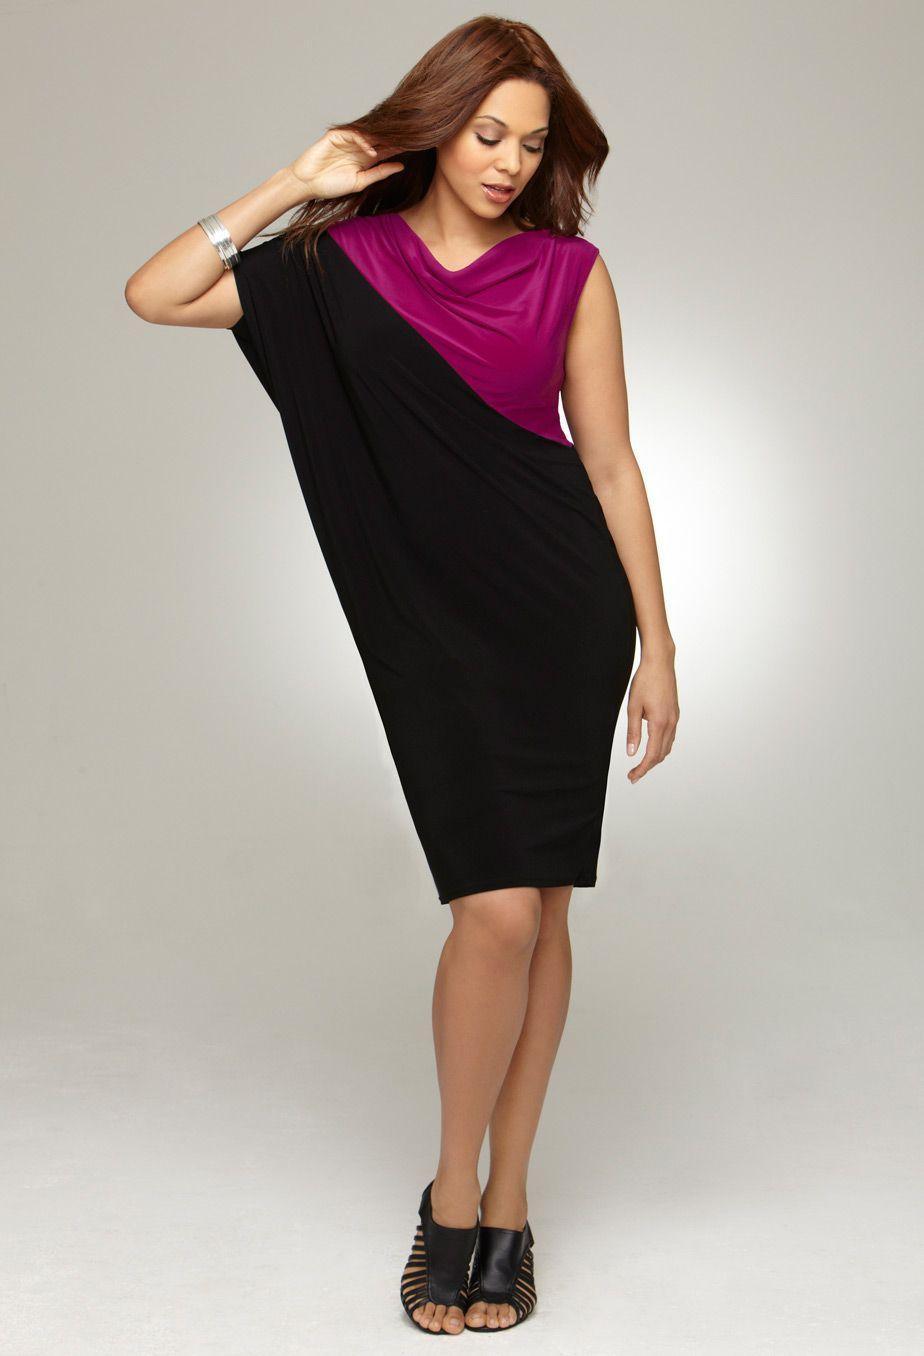 Love This Dress Clothes Pinterest Colorblock Dress Clothes